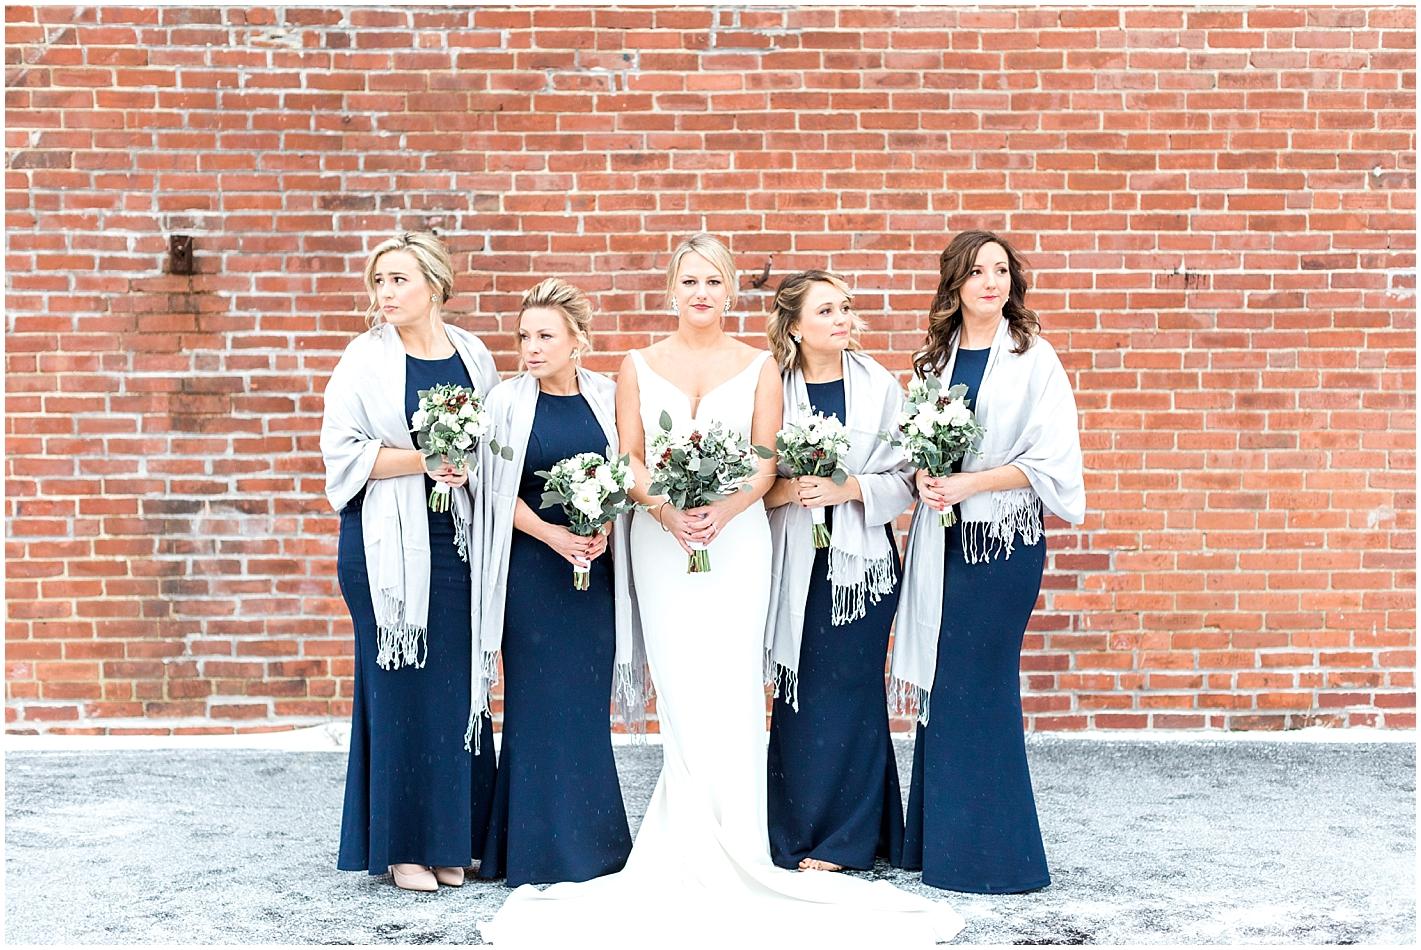 Gray bridesmaid Shawls Photo by Alyssa Parker Photography